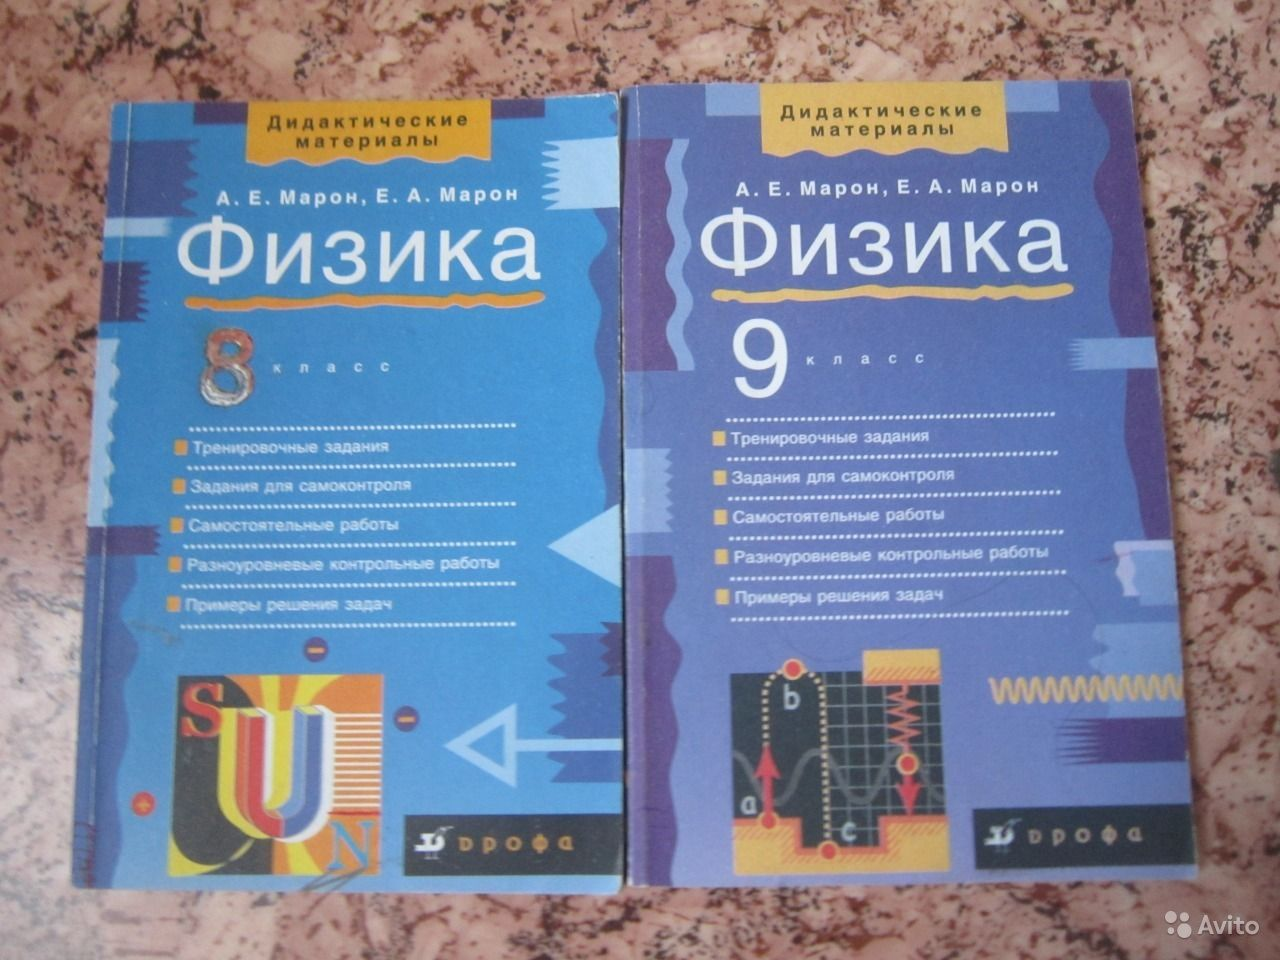 Решебник Задачника По Химии 10 Класс Н. Е. Кузнецова А. Н. Левкина